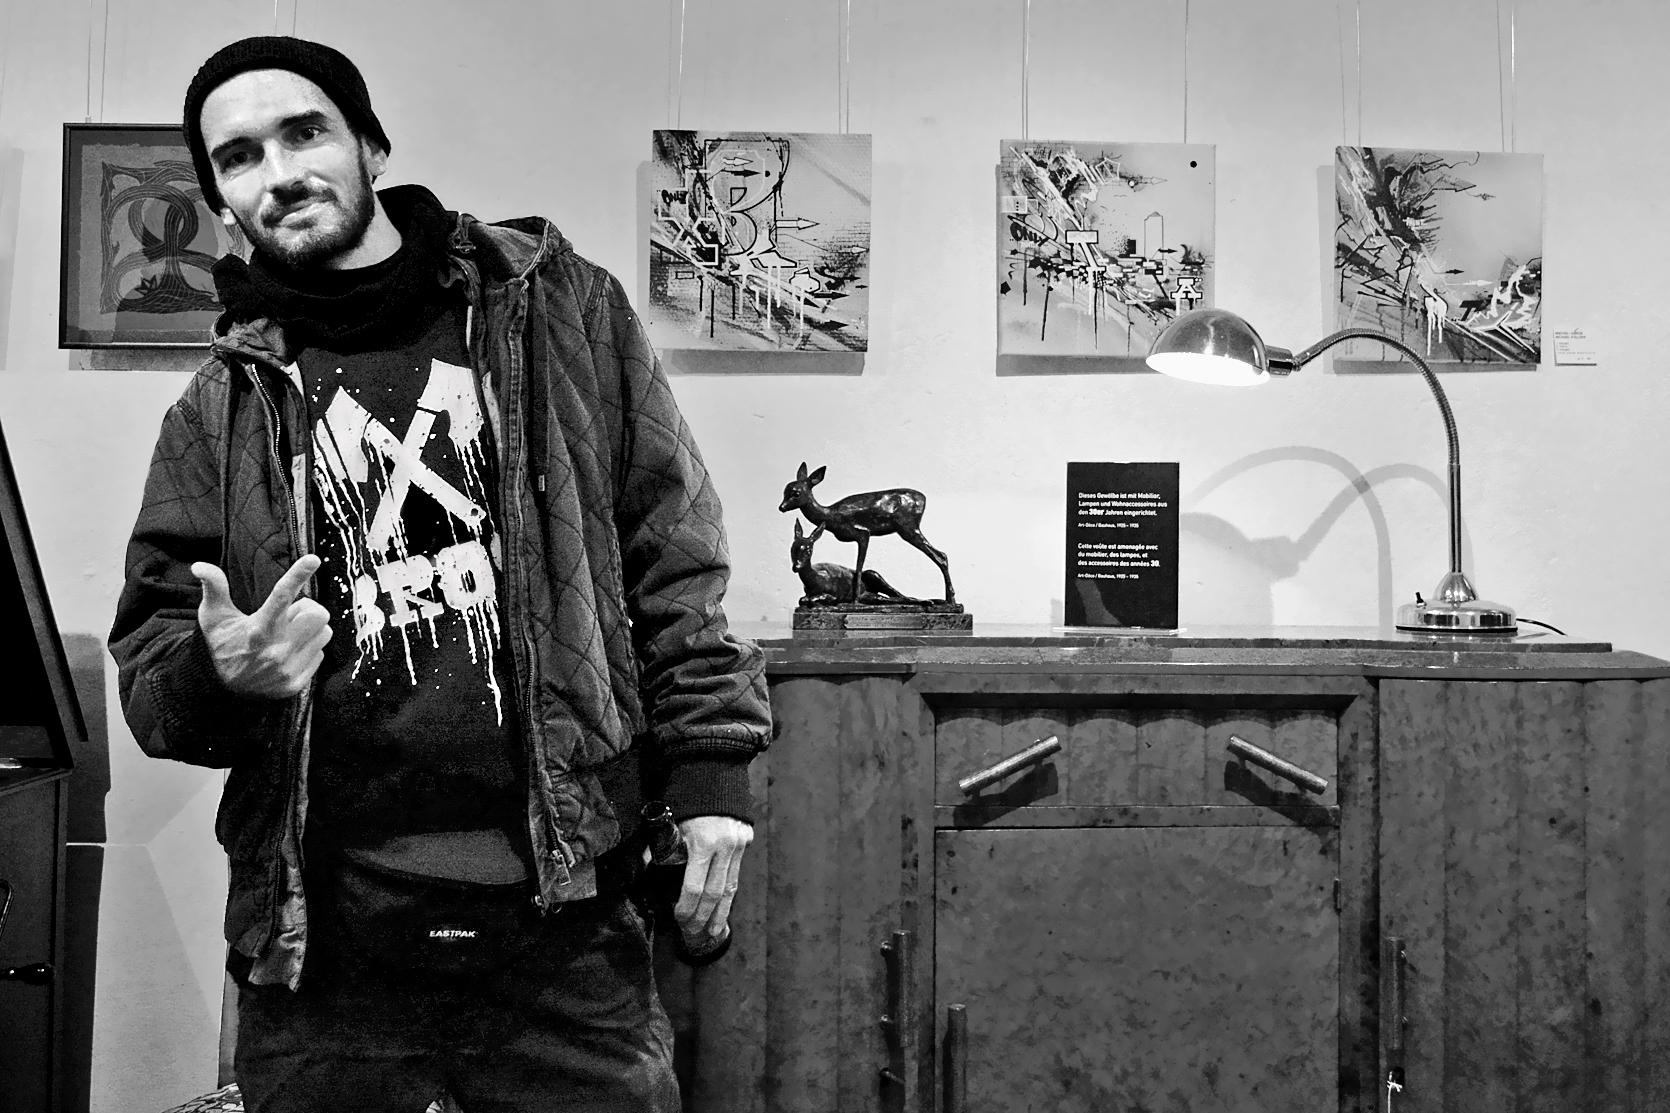 Ausstellung der Graffiti-Künstler X-Bros